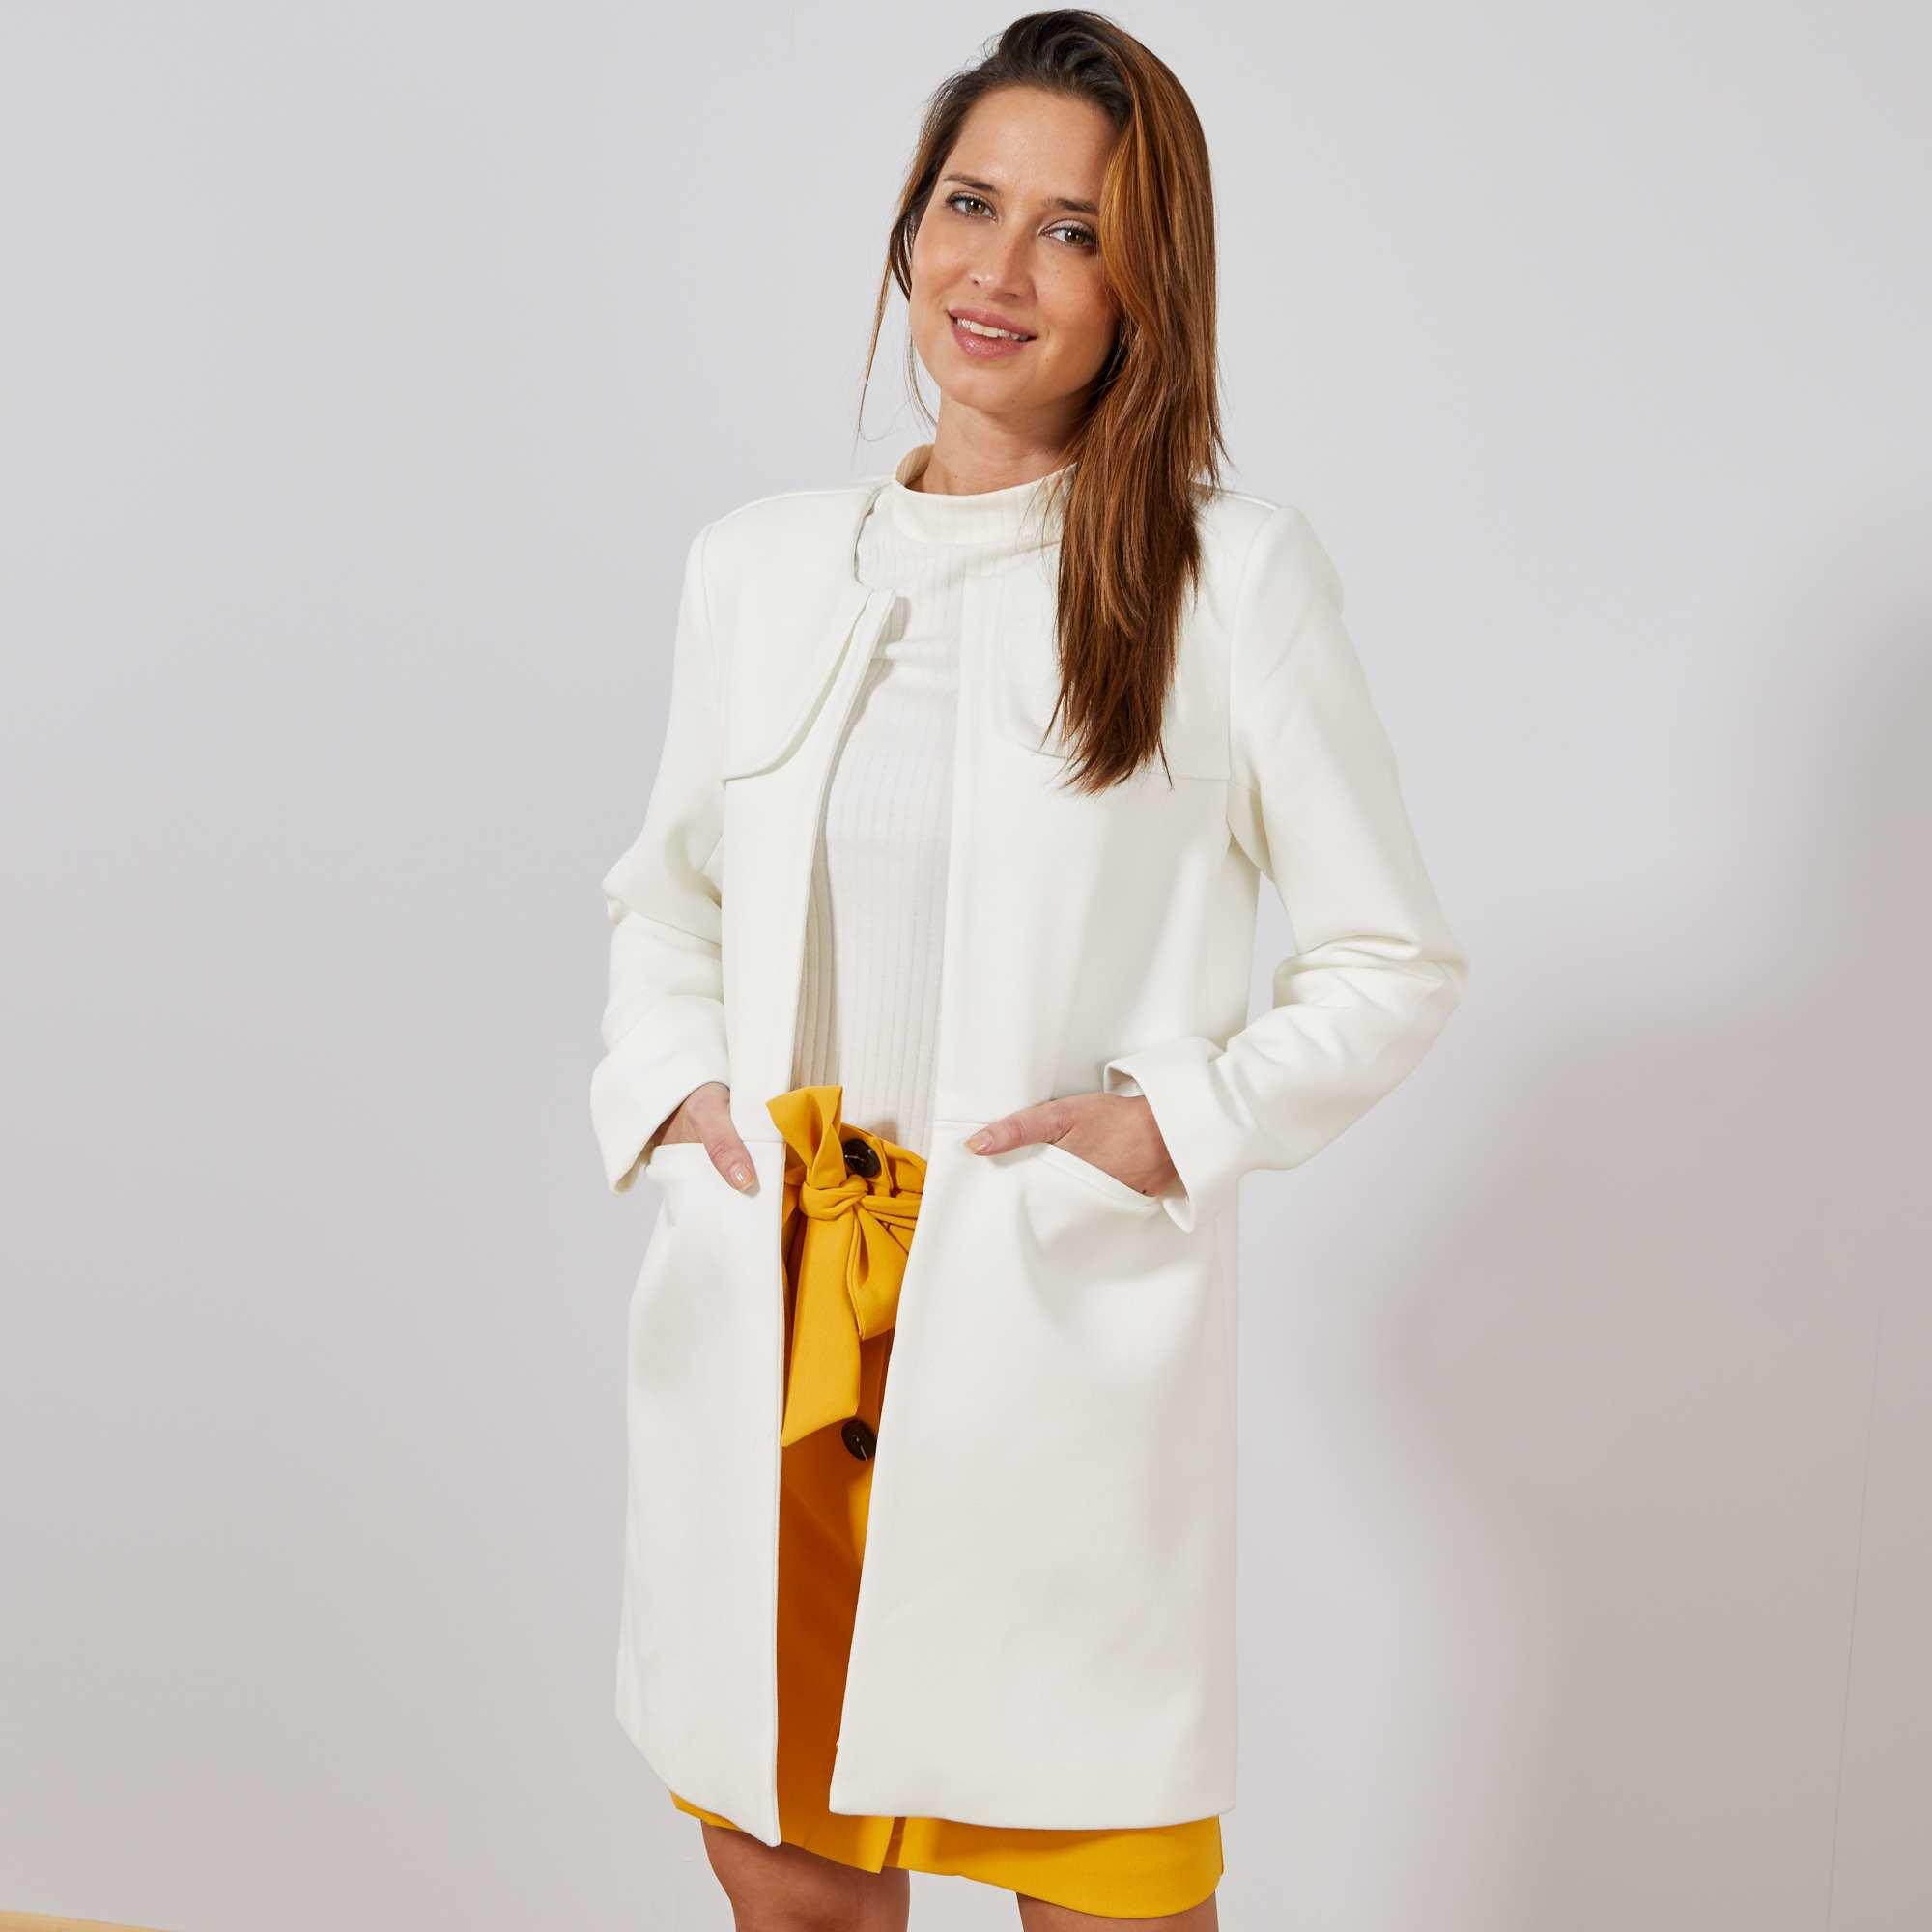 manteau habill col rond femme blanc kiabi 40 00. Black Bedroom Furniture Sets. Home Design Ideas